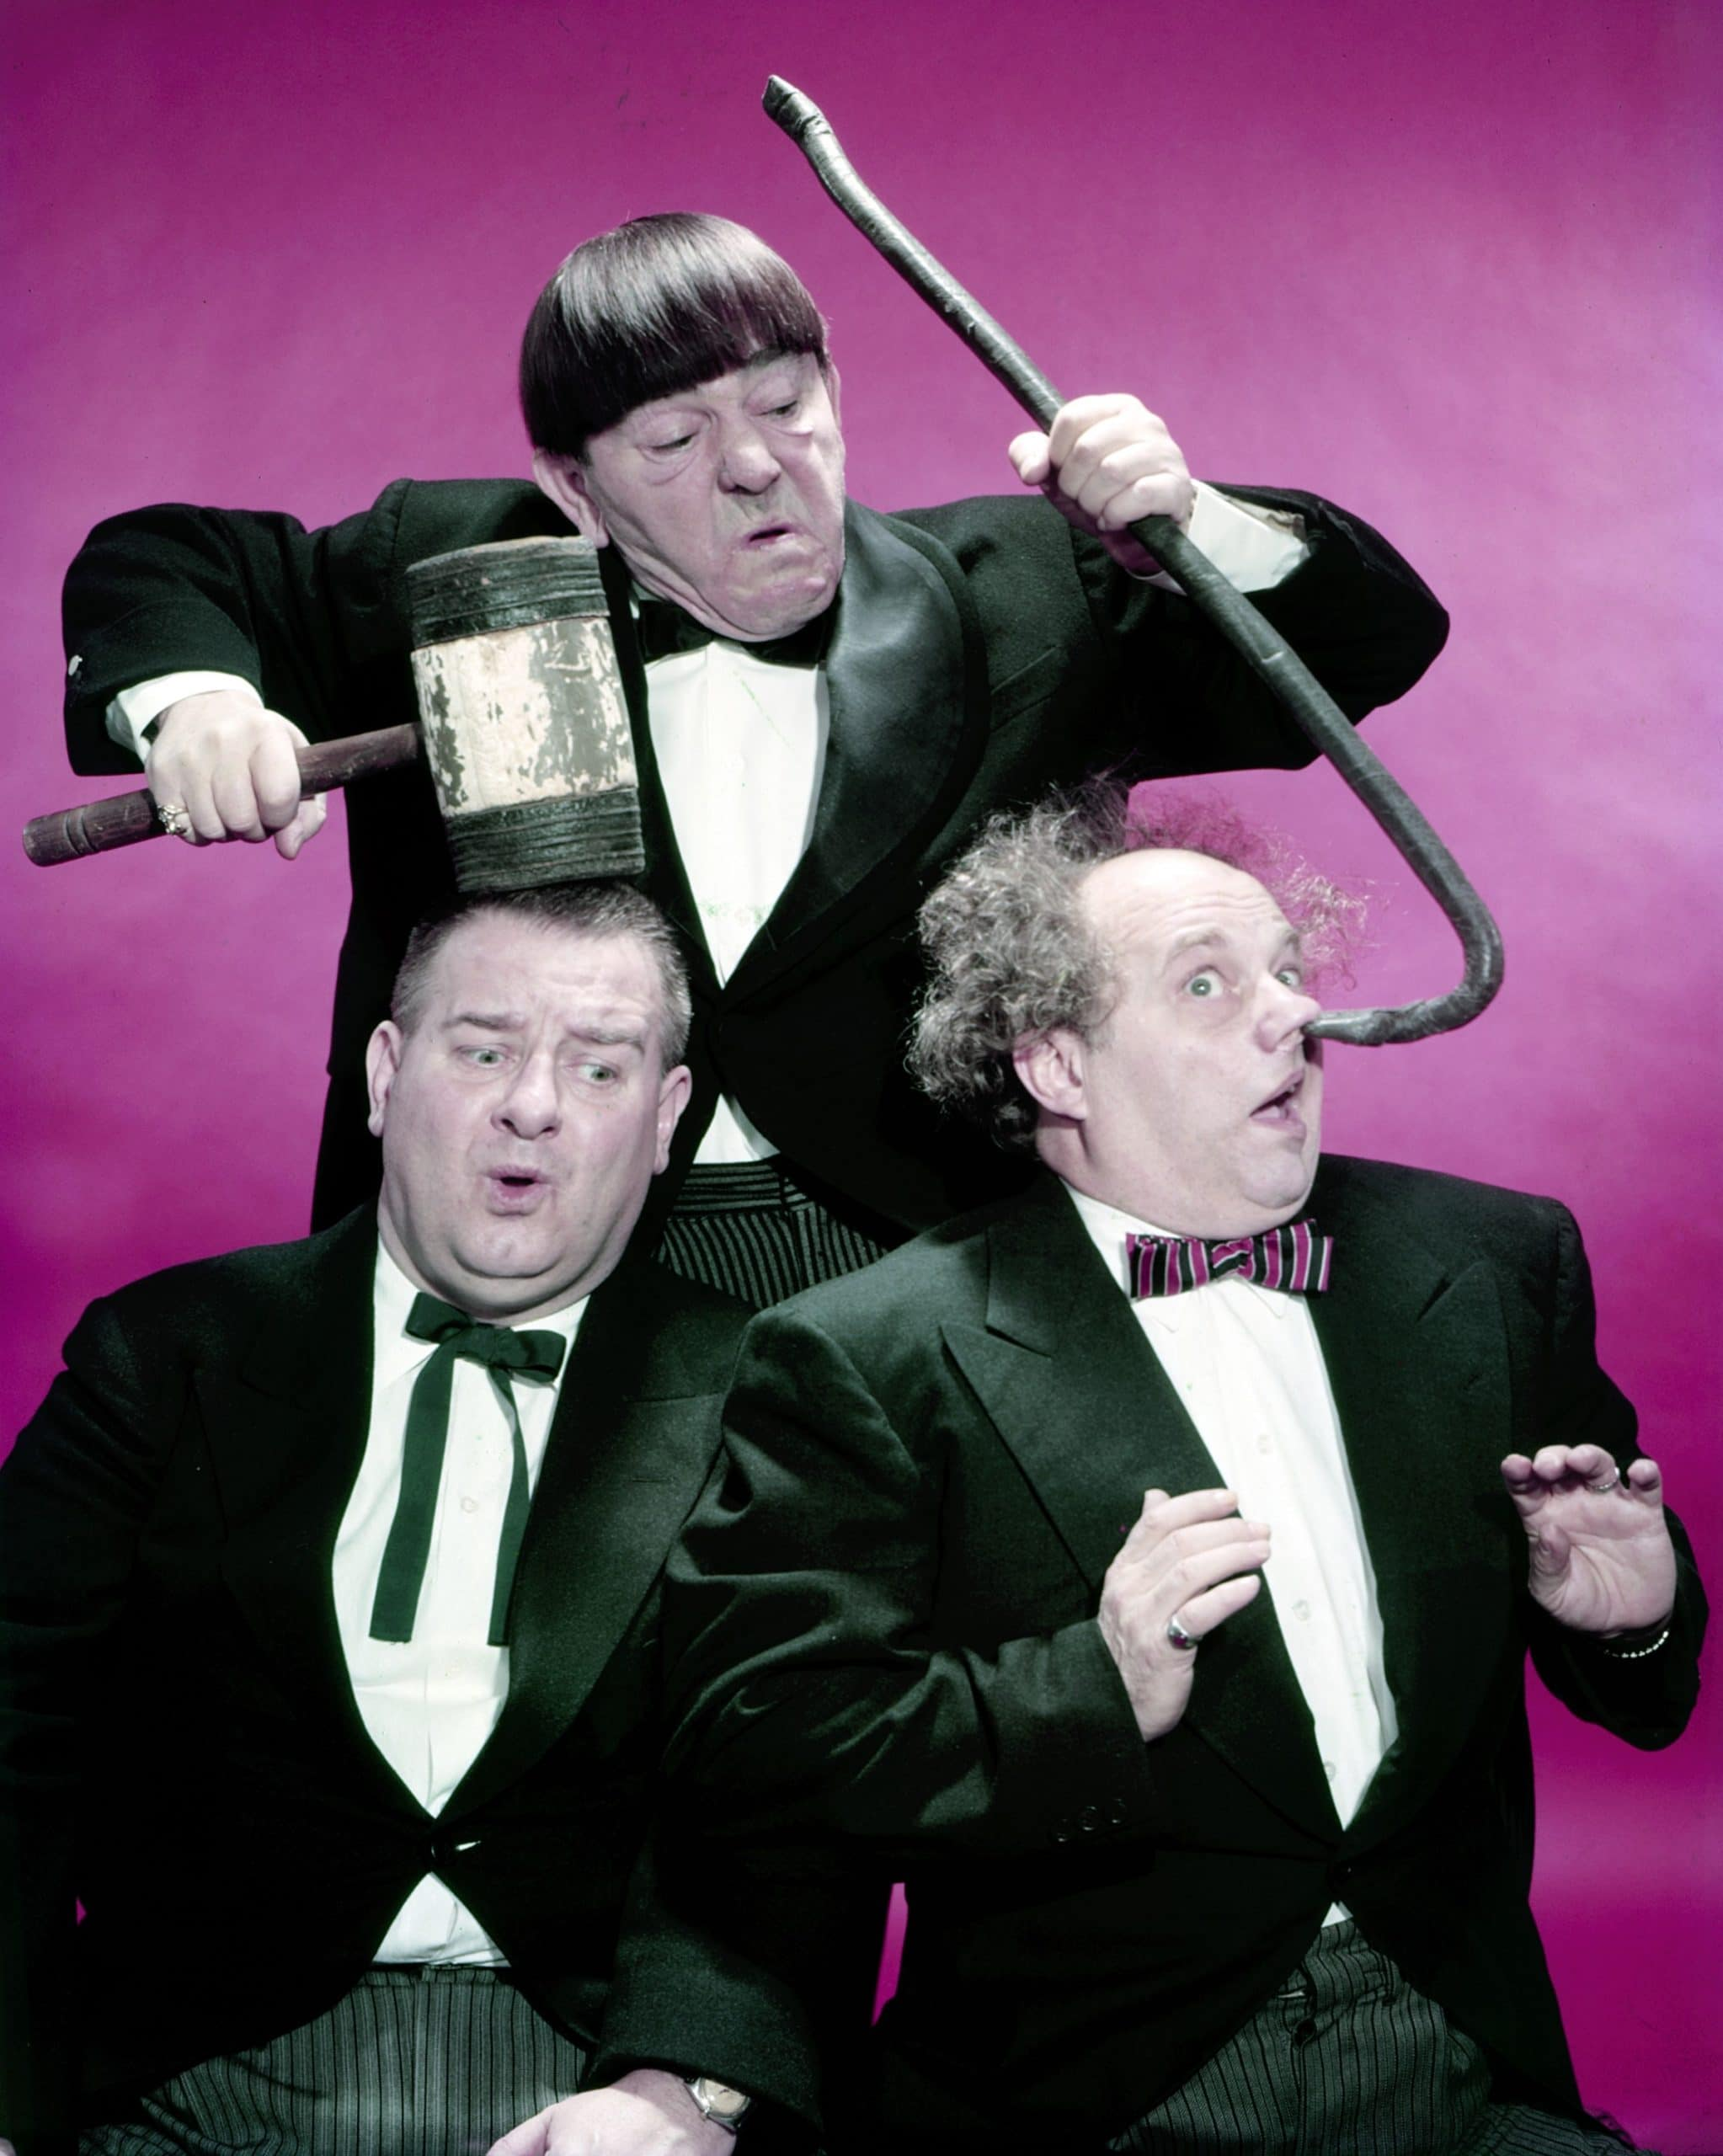 THE THREE STOOGES, from left: Joe DeRita, Moe Howard, Larry Fine, 1960s